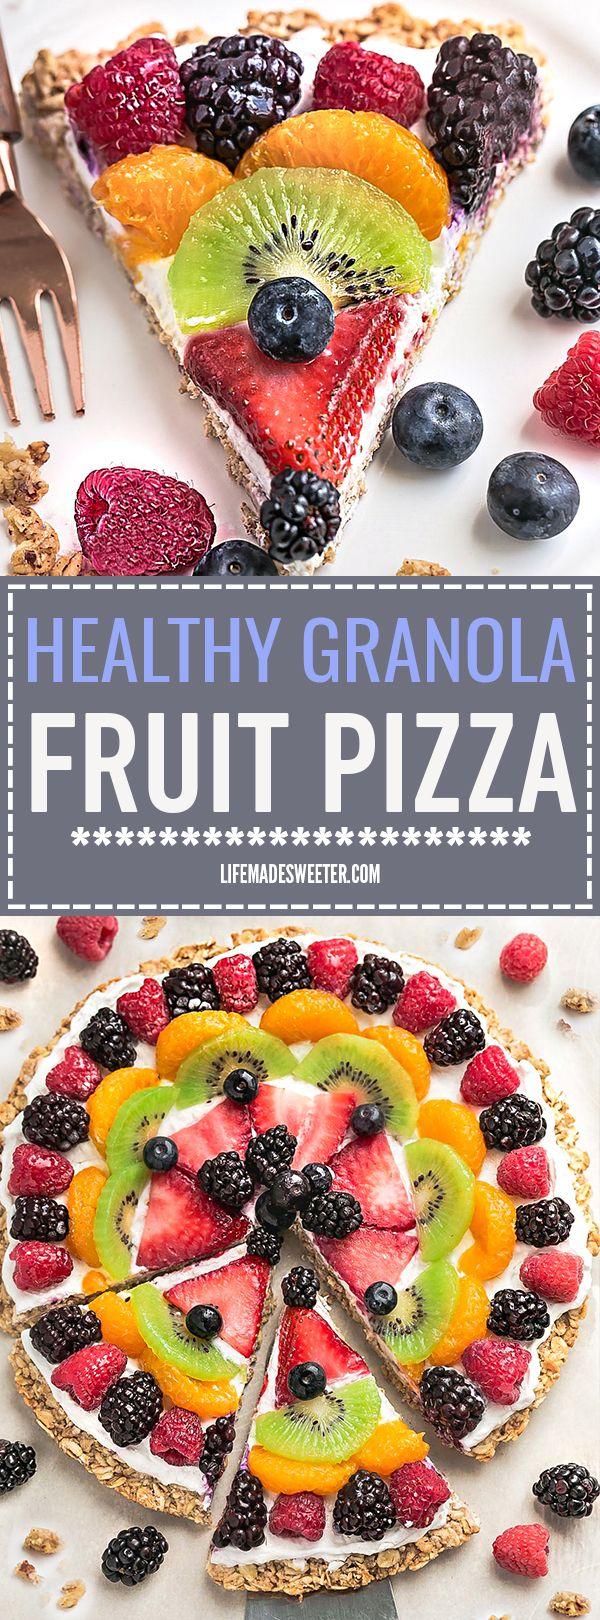 Healthy Fruit Pizza Recipe | An Easy Fresh Fruit Breakfast or Dessert